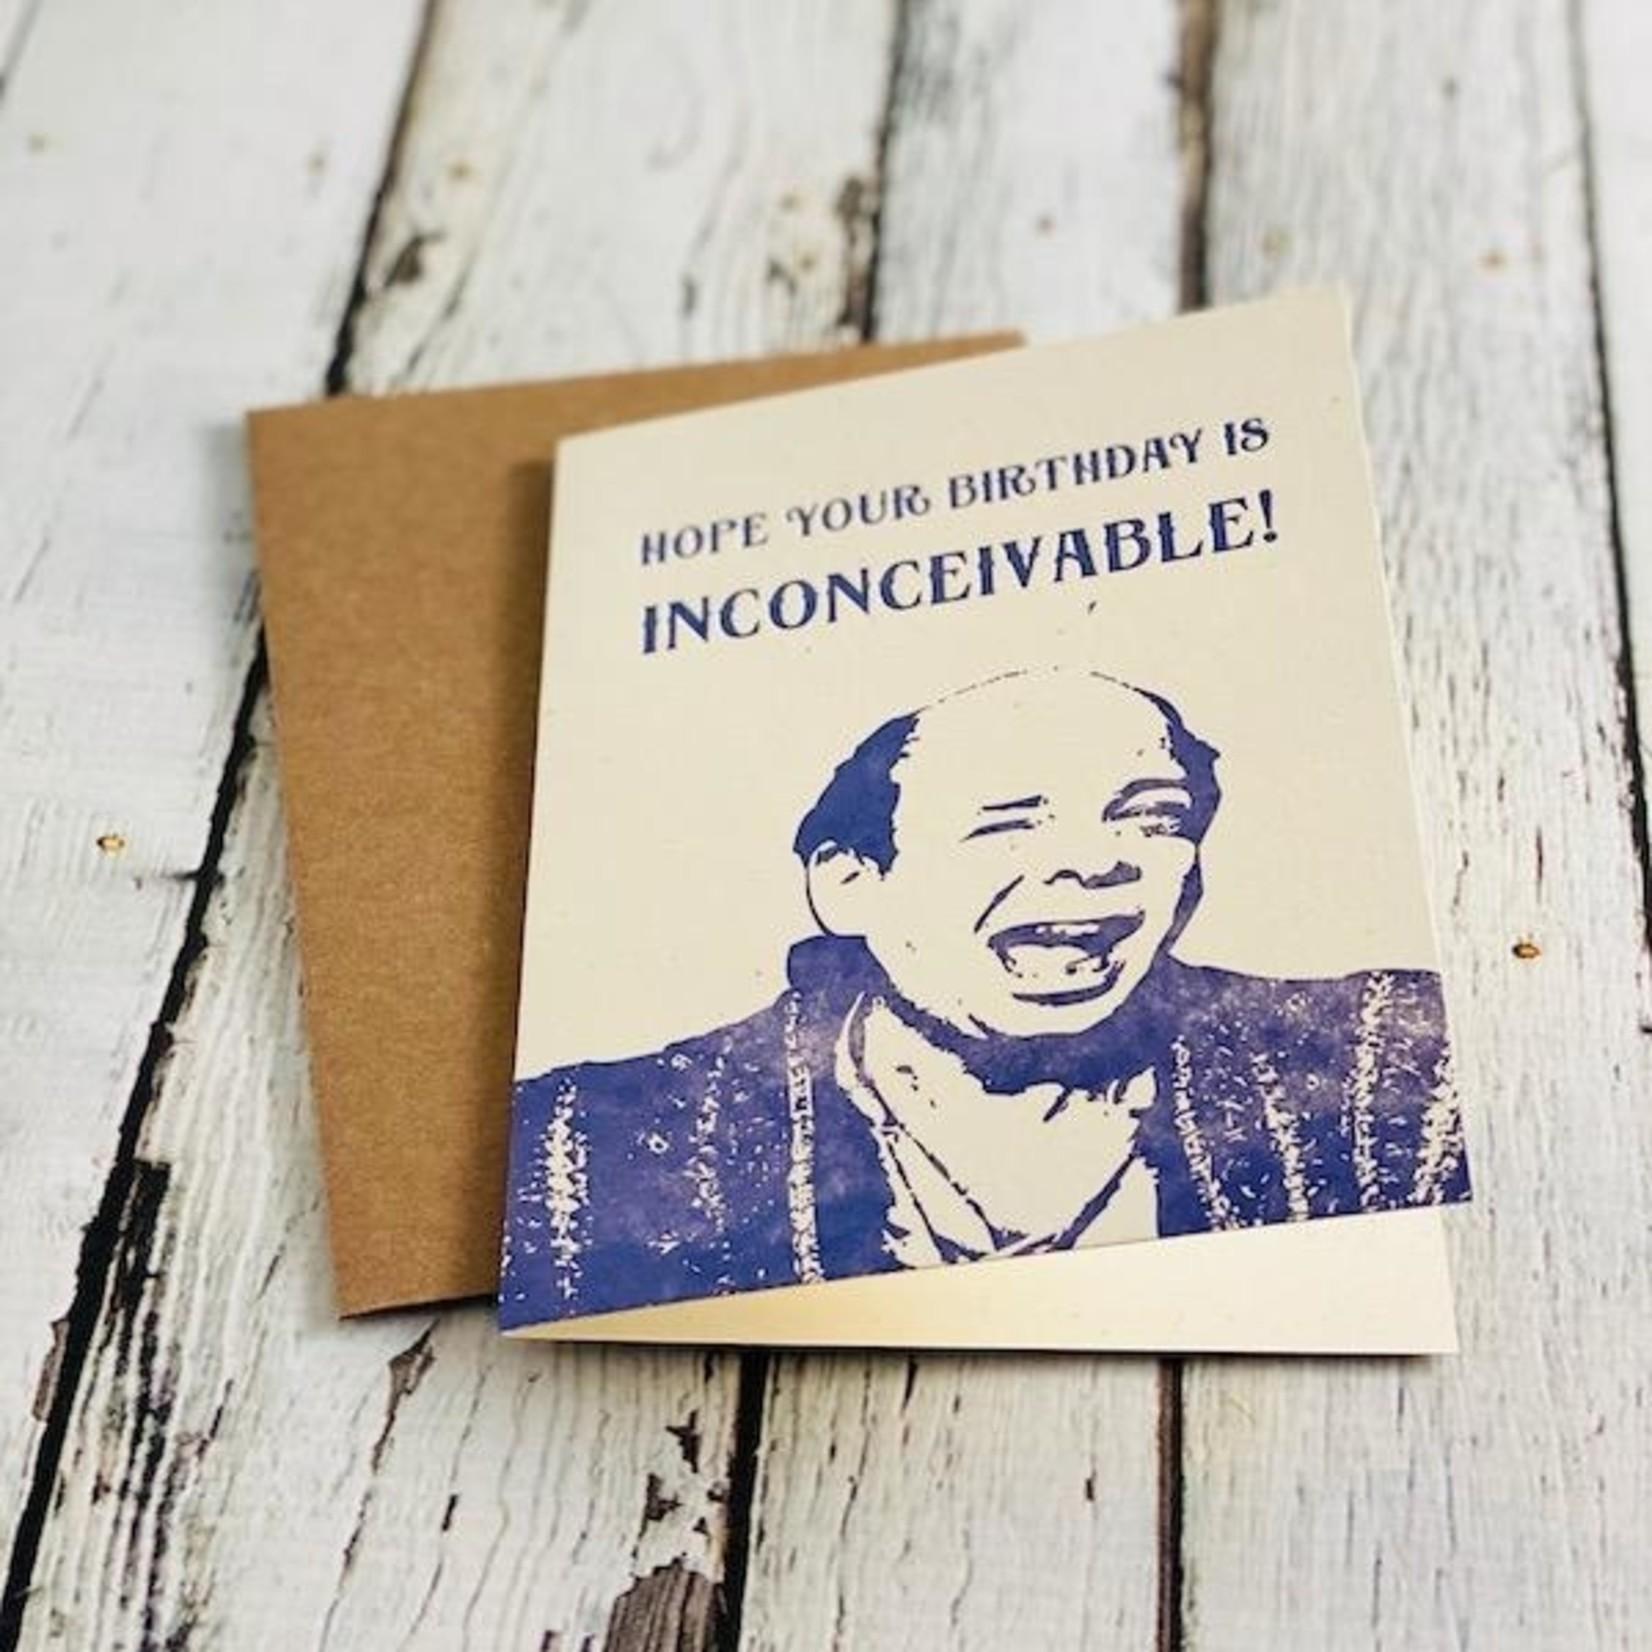 Inconceivable Birthday Card